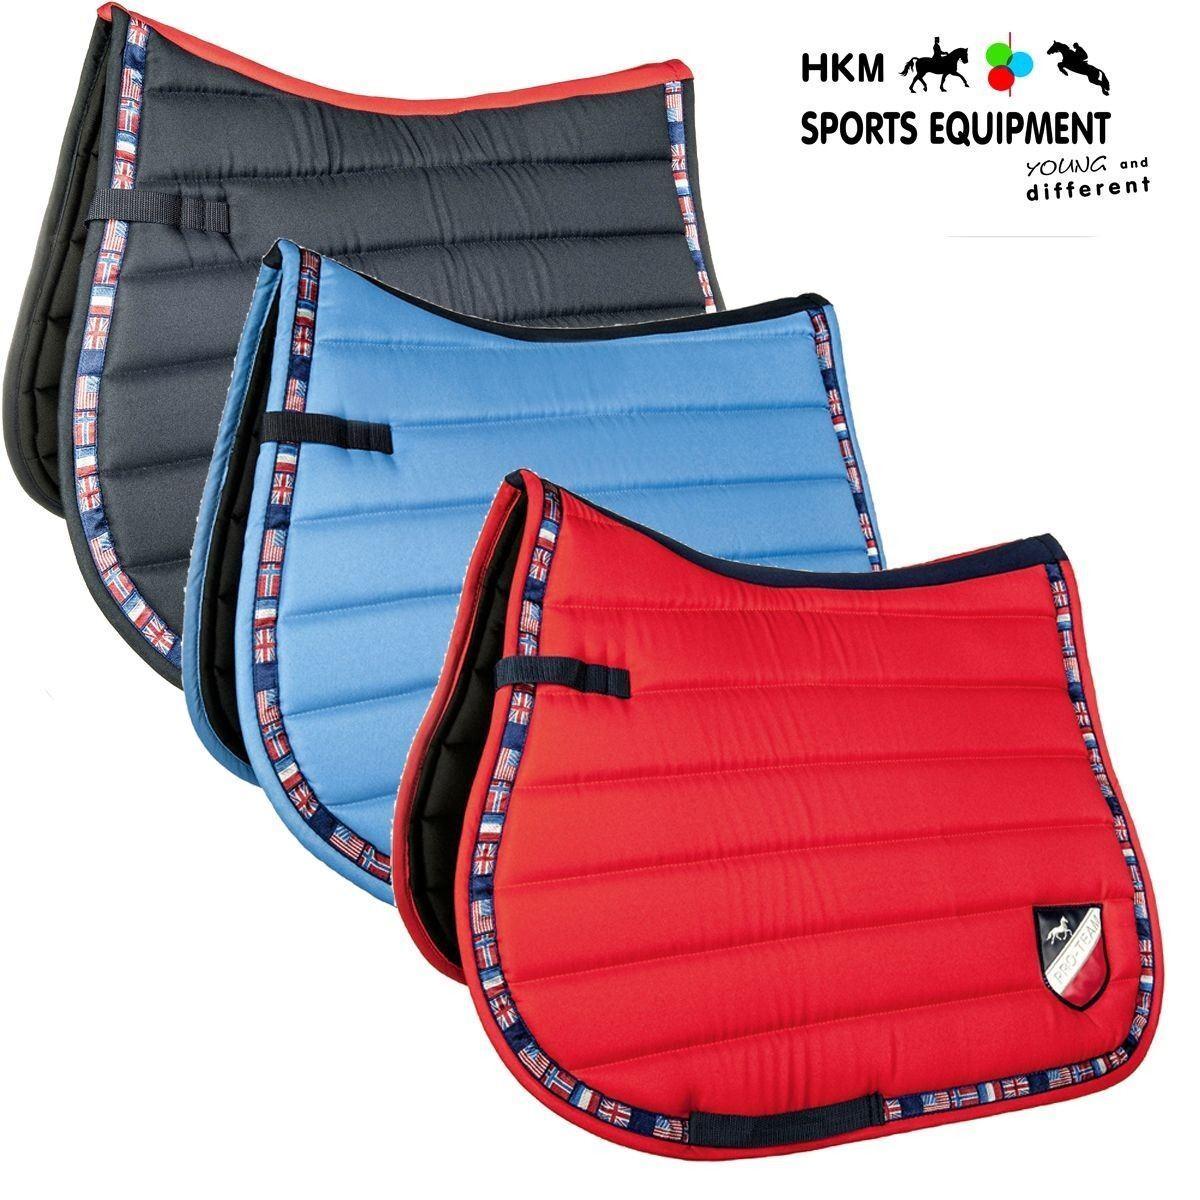 HKM  Pro Team International Flags Horse Riding Equine Numnah Comfort Saddle Pad  order now enjoy big discount